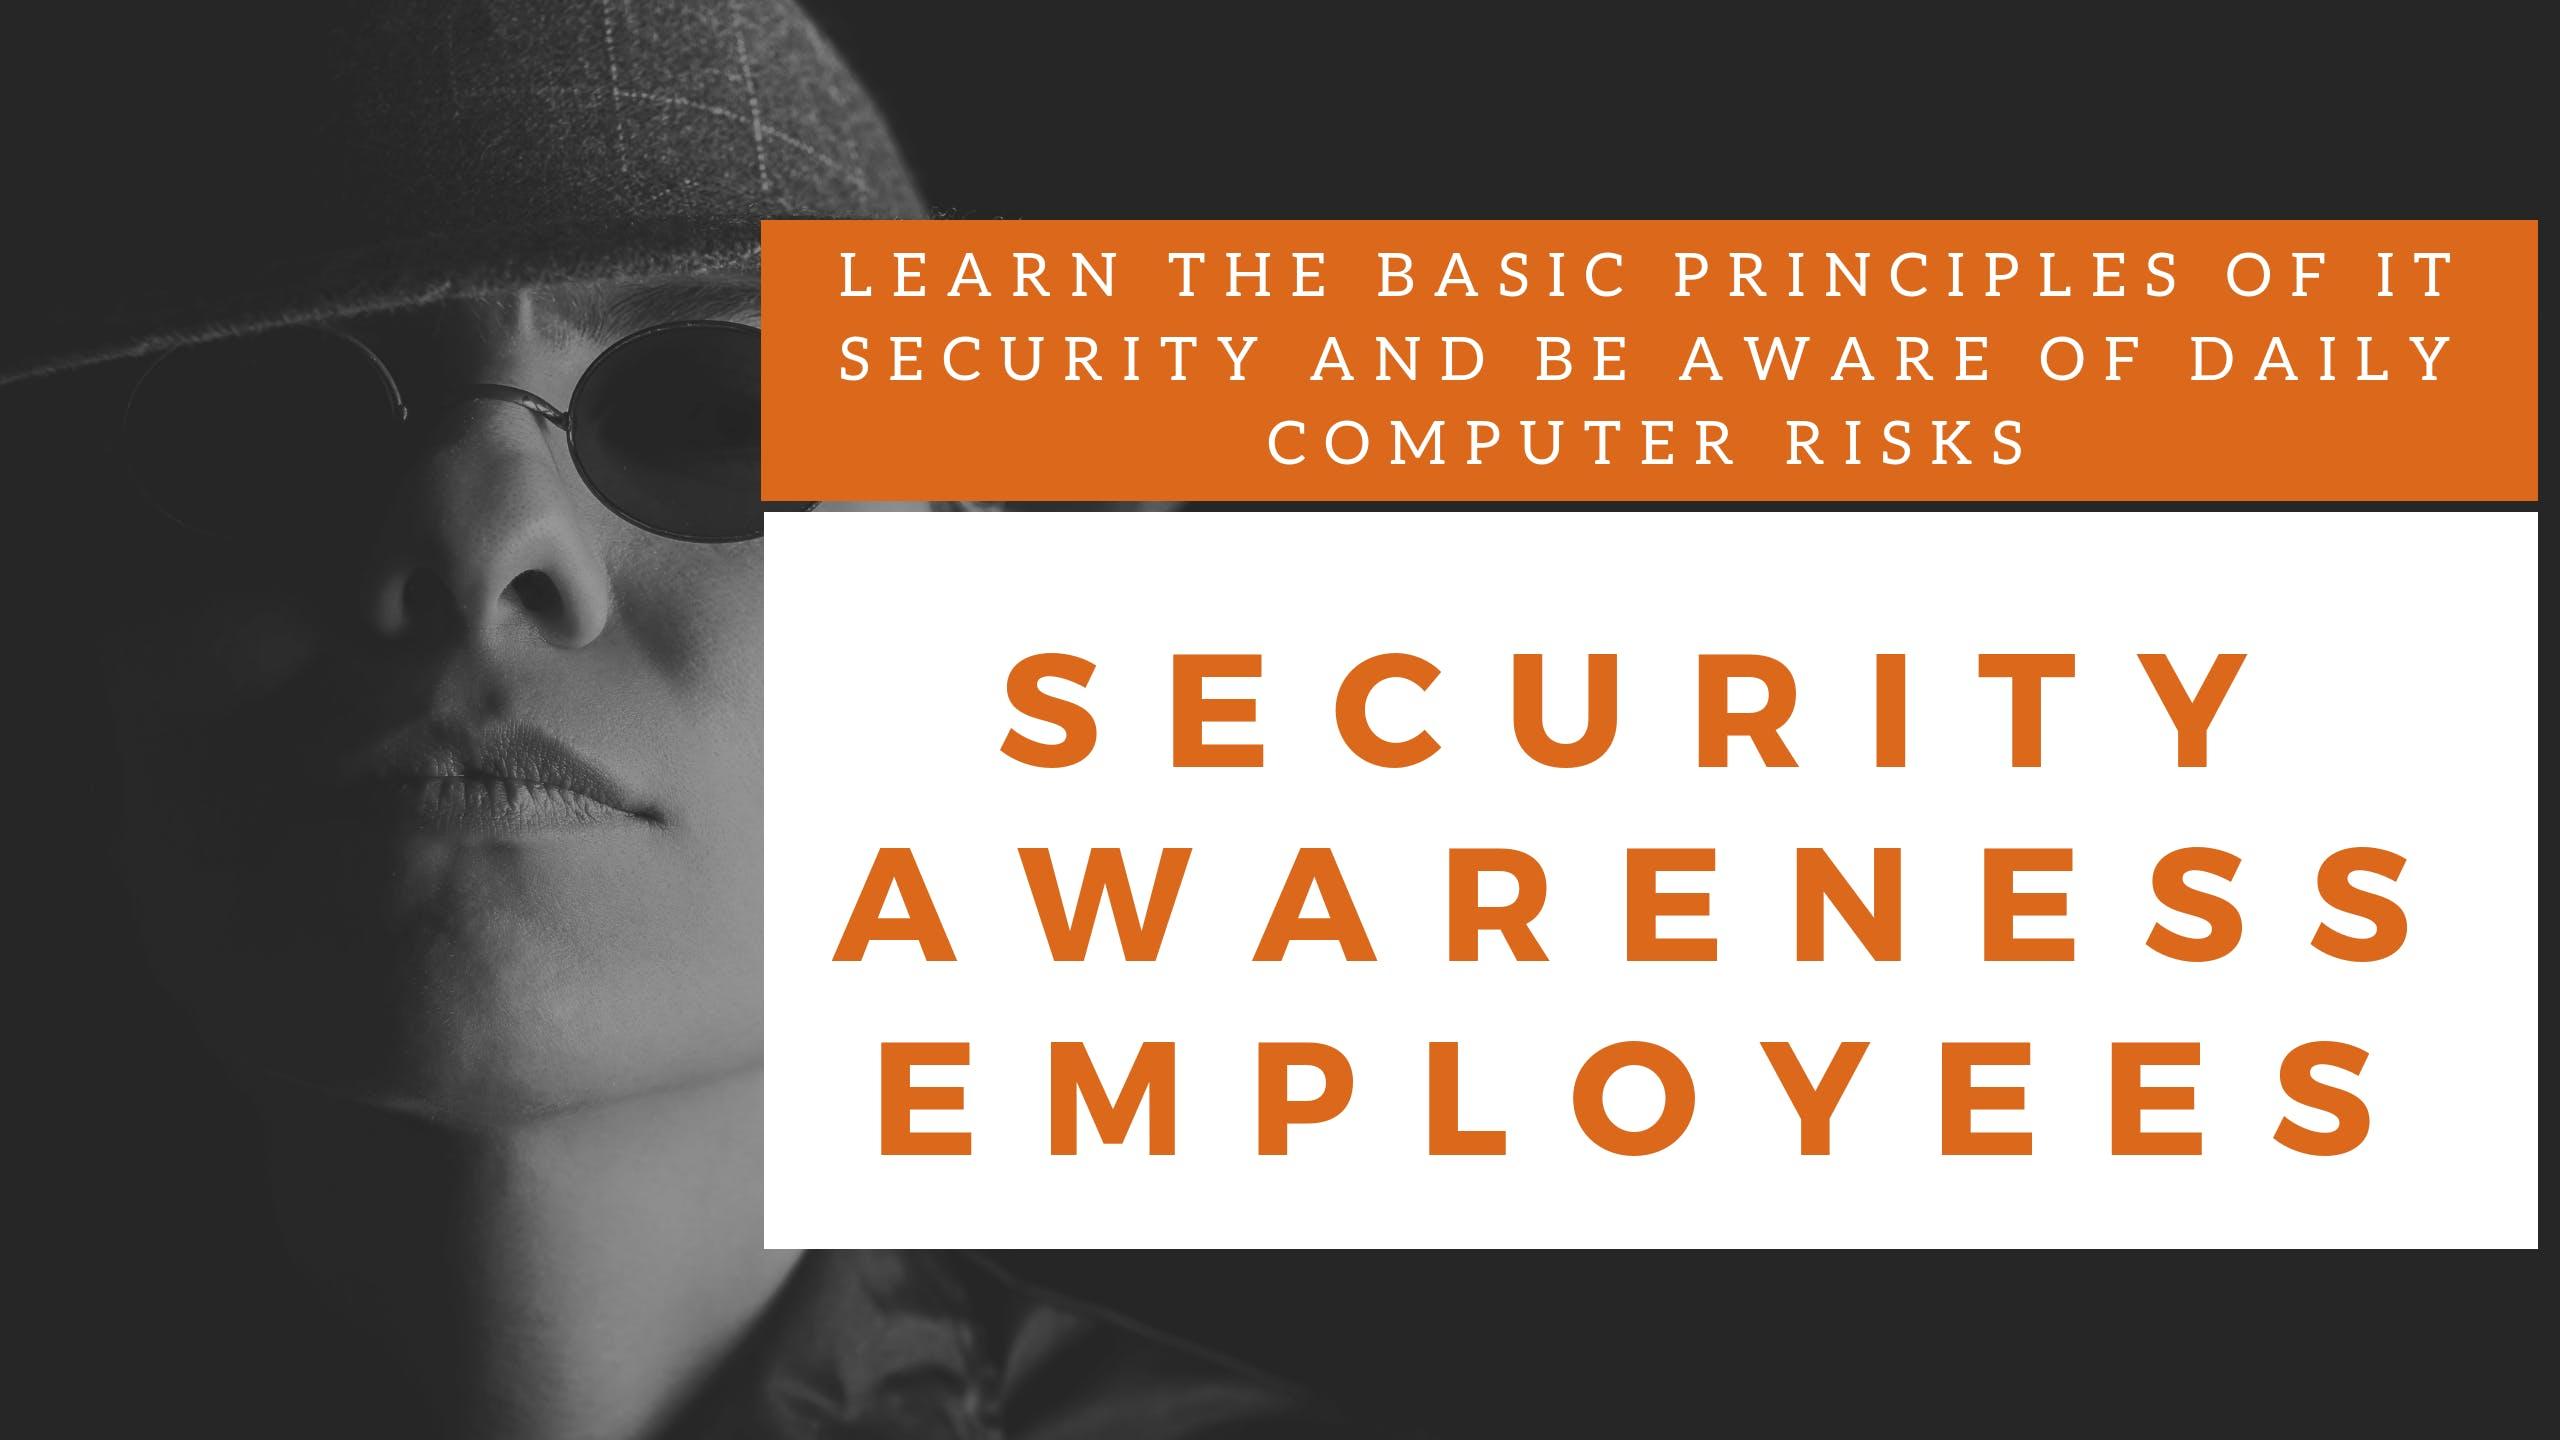 Security Awareness Employees Training (English)